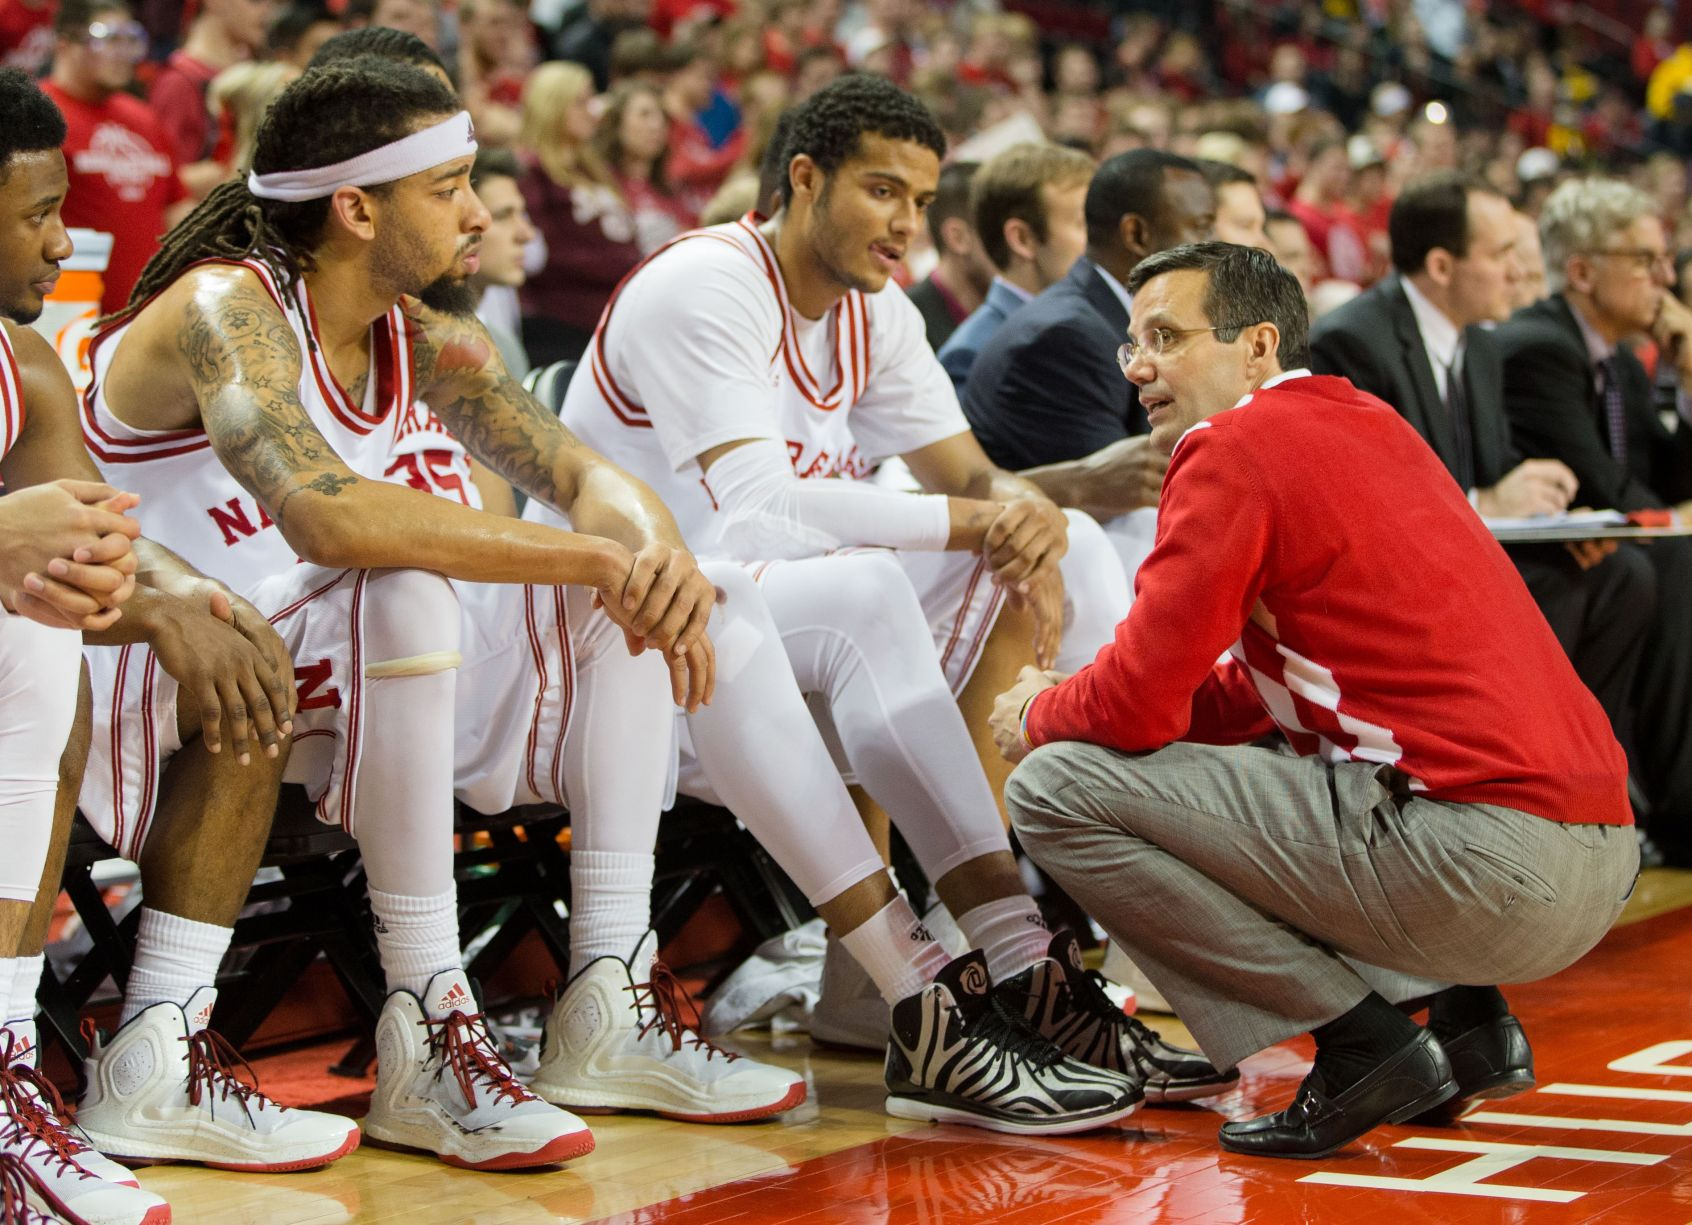 Nebraska coach Tim Miles denies reports of